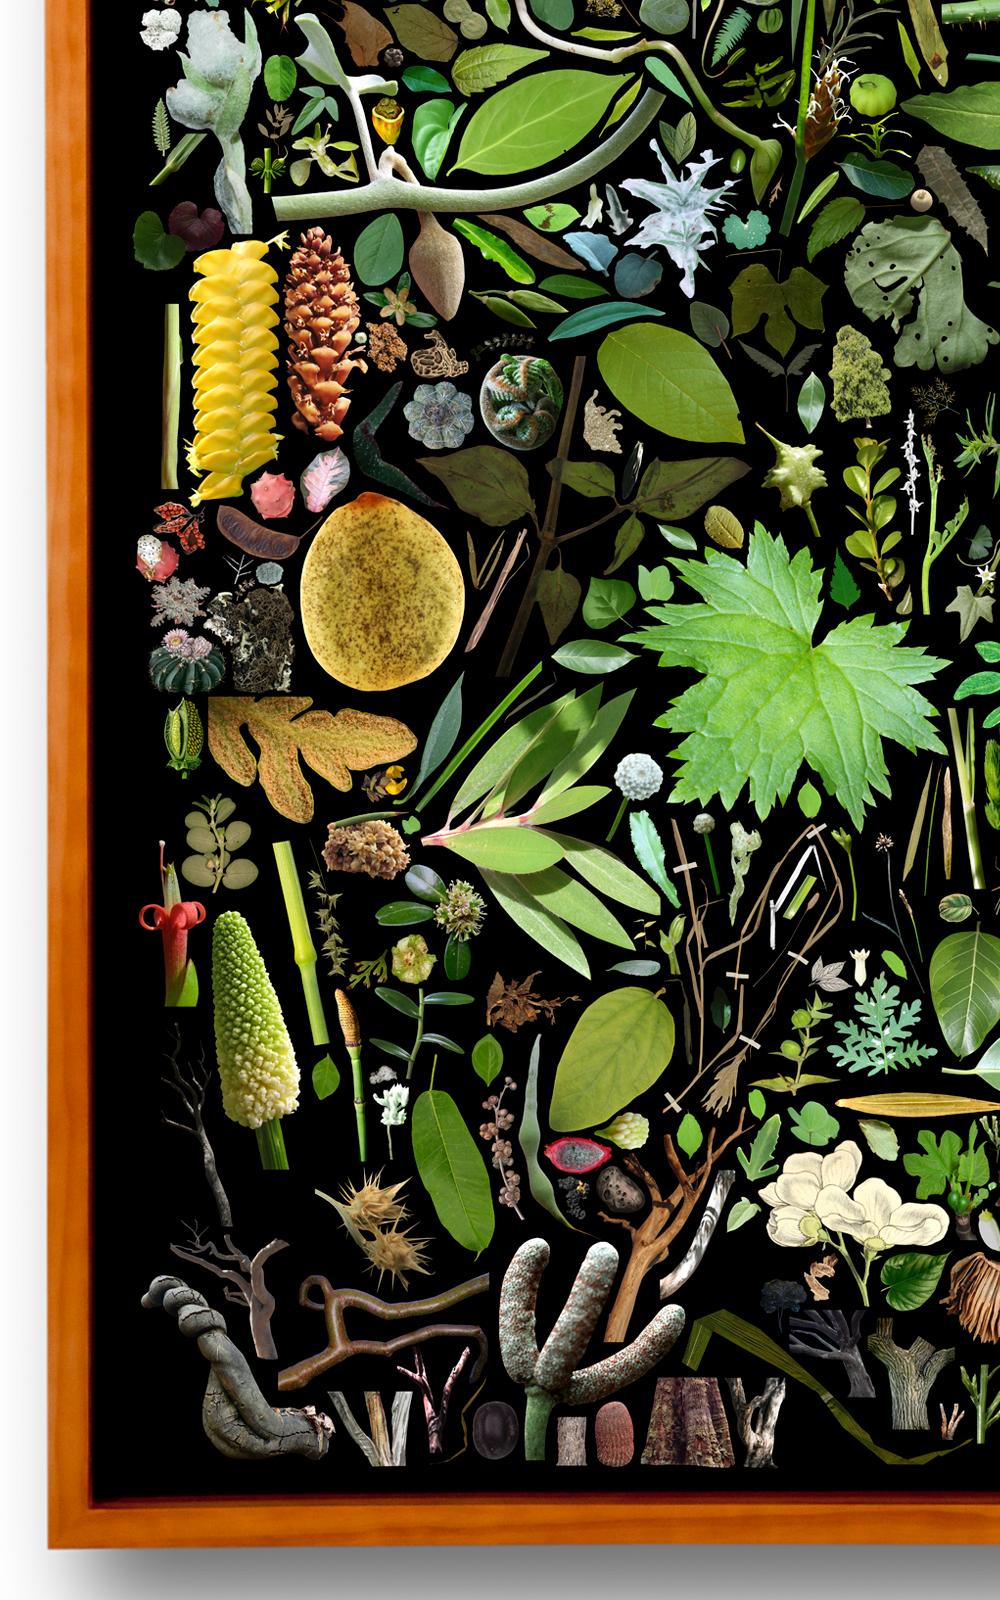 Case Simmons, Simmons & Burke, Plant Collection Palette #1, Digital Collage,Digital Art, Photoshop Collage, Contemporary Collage,Case Simmons Art, Collage Fine Art, Plant Art, Digital Flower Art, Collection Art, Archive Art, Kohn Gallery